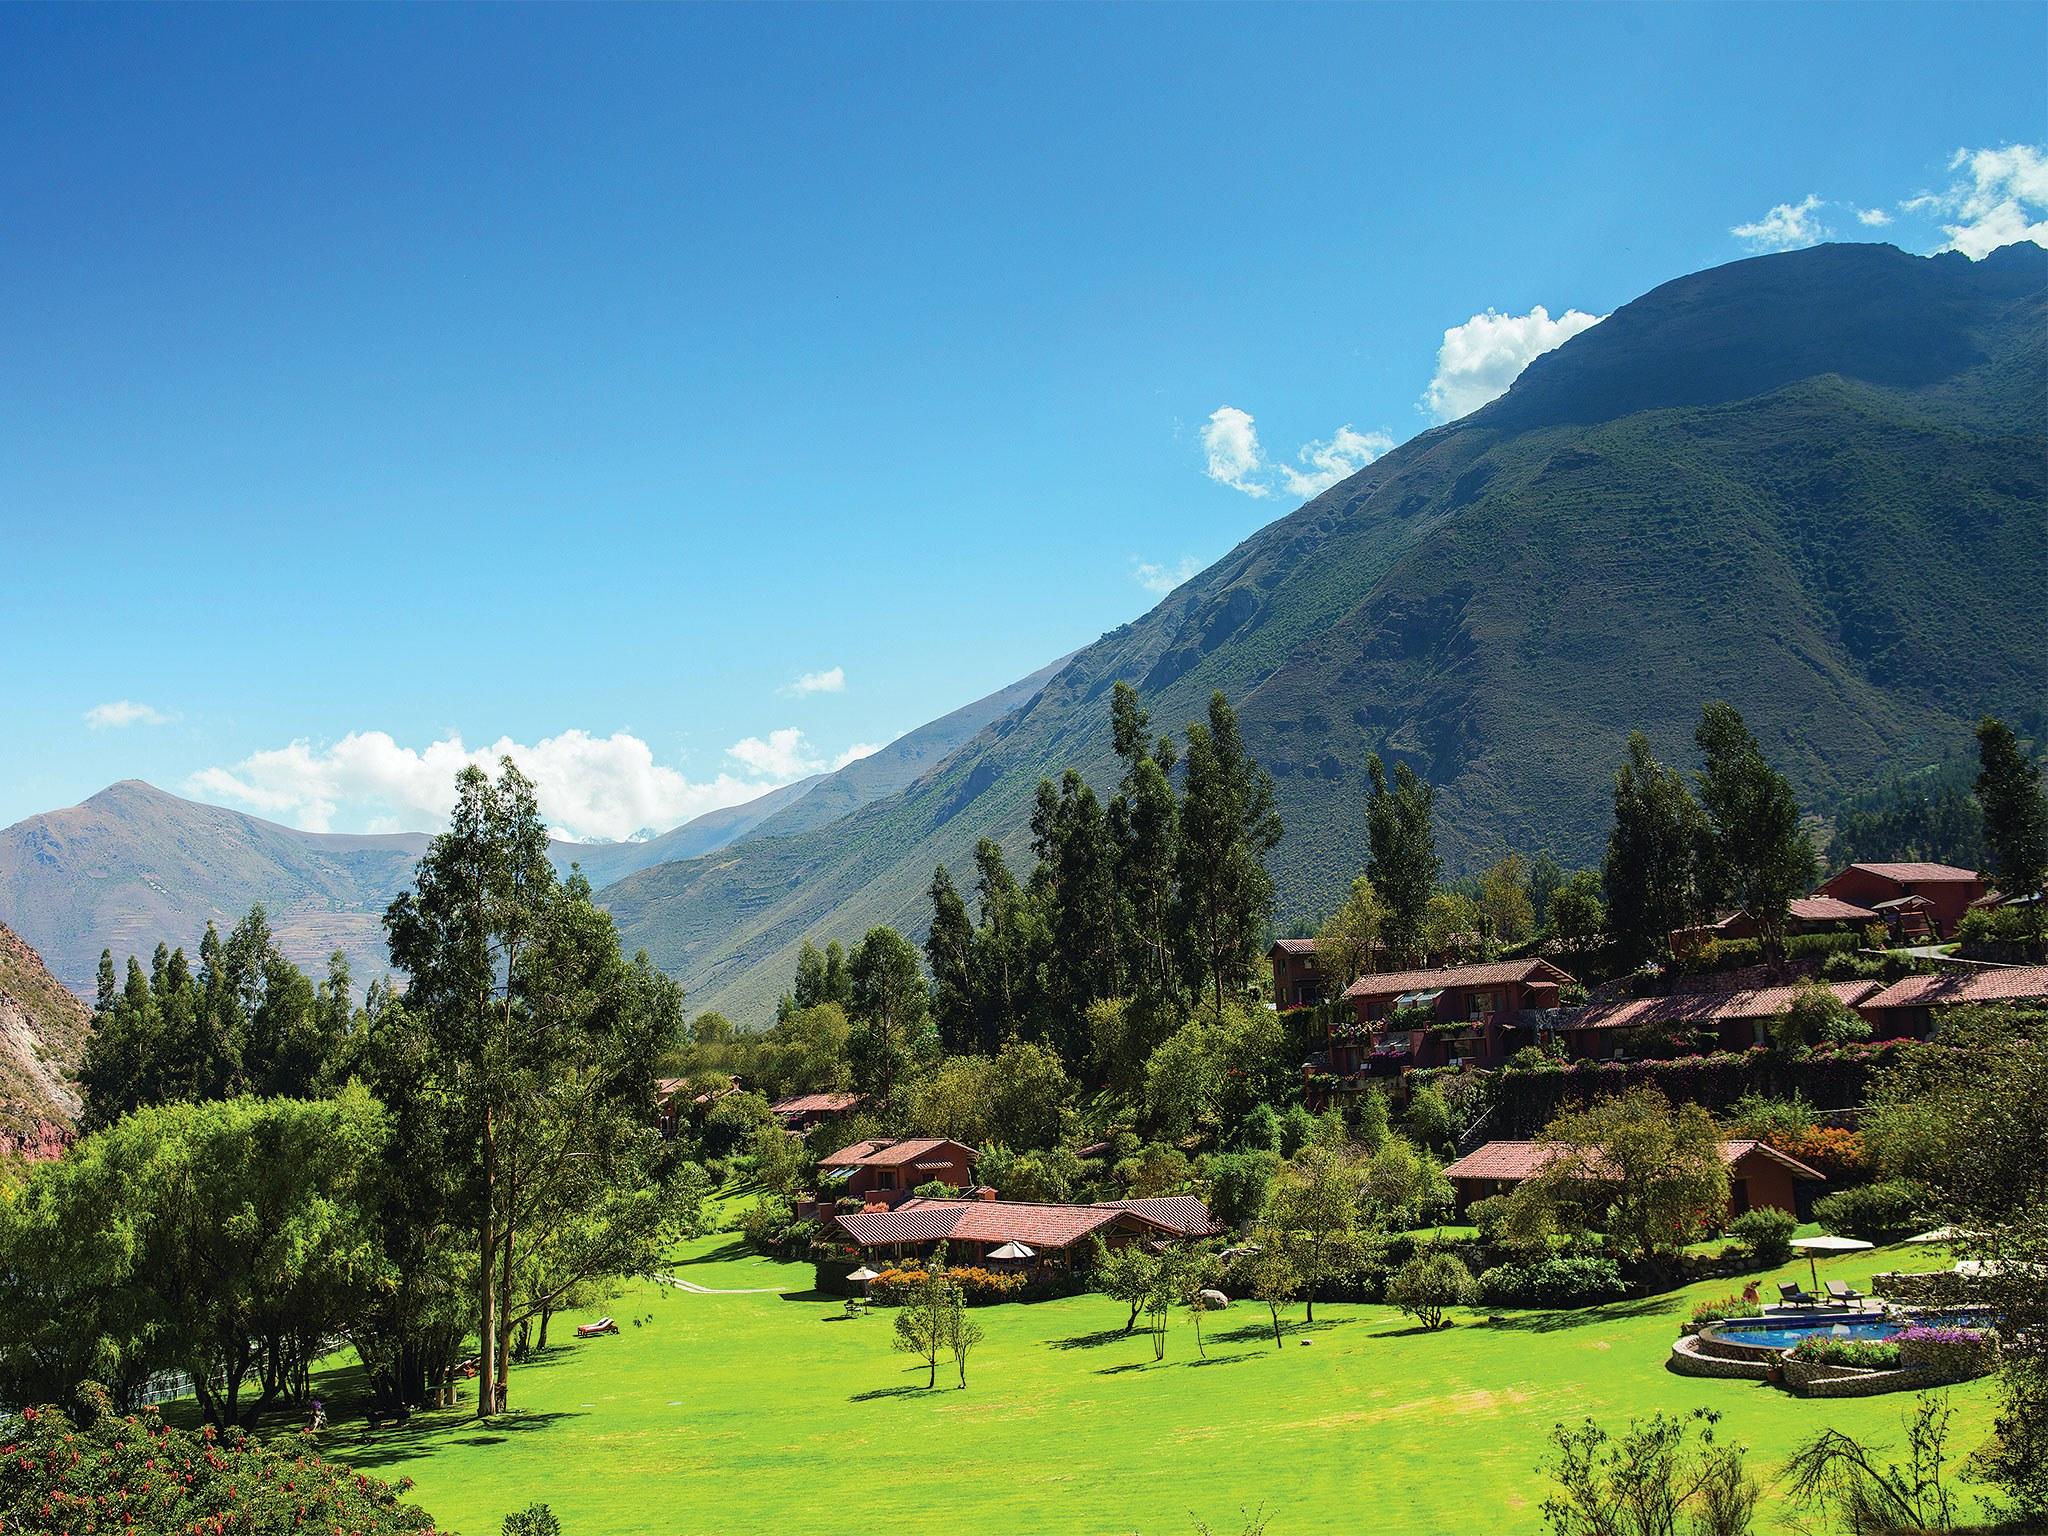 belmond-hotel-rio-sagrado-view-rca-2014.jpg